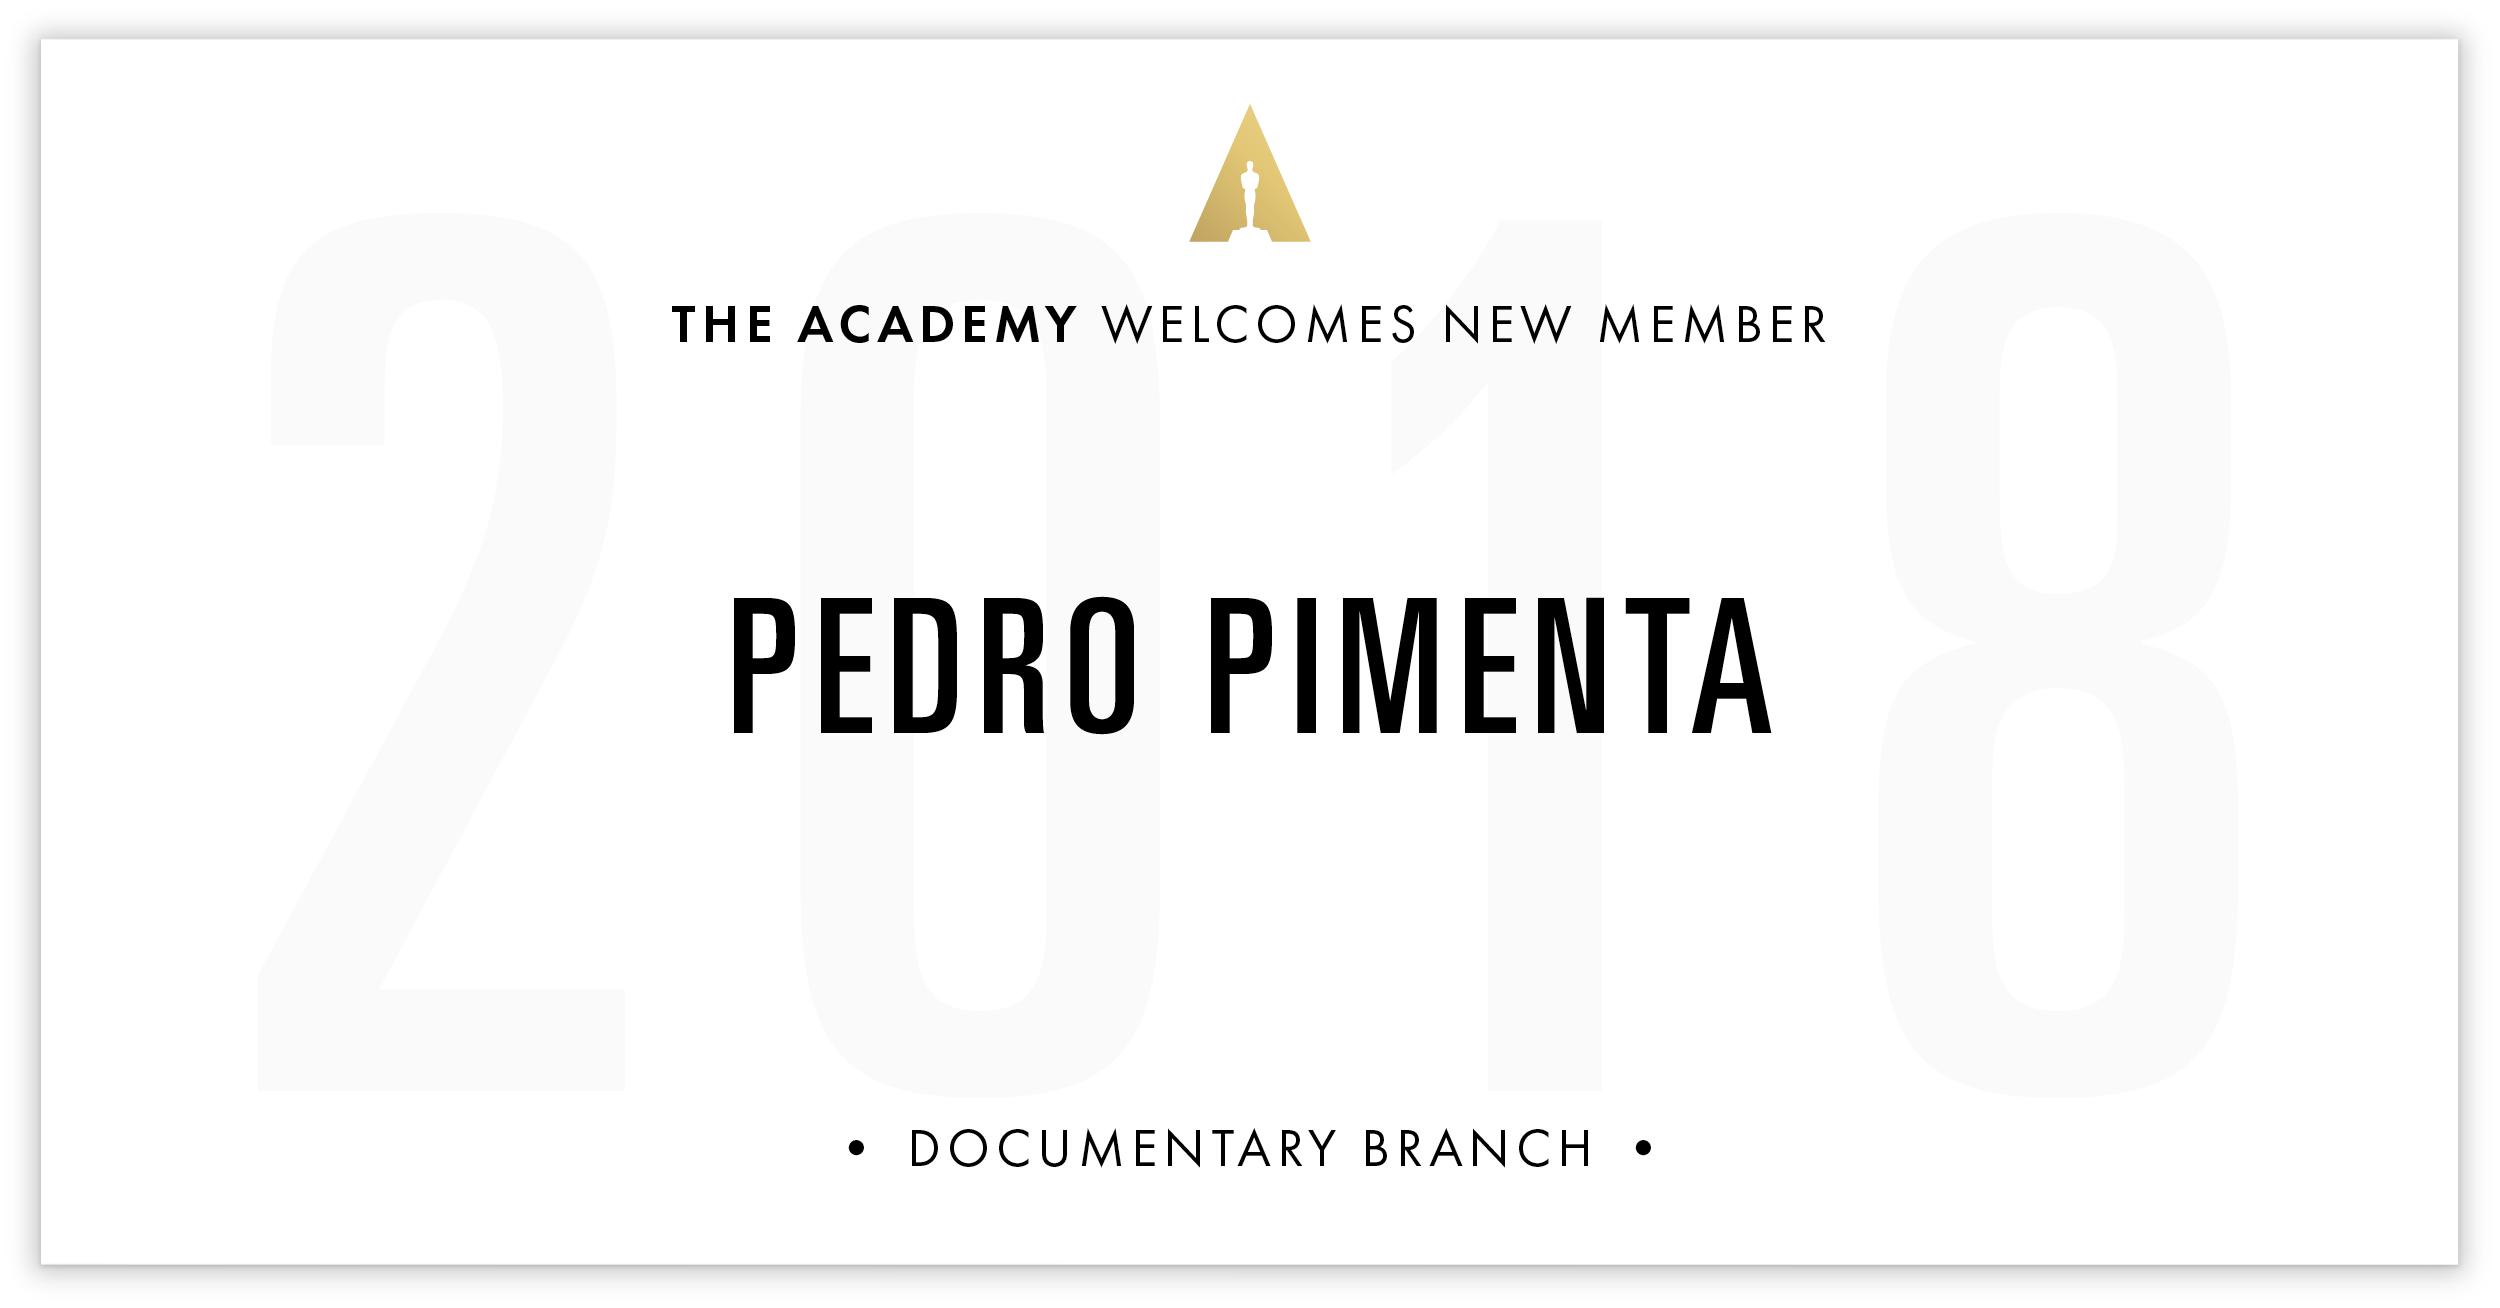 Pedro Pimenta is invited!